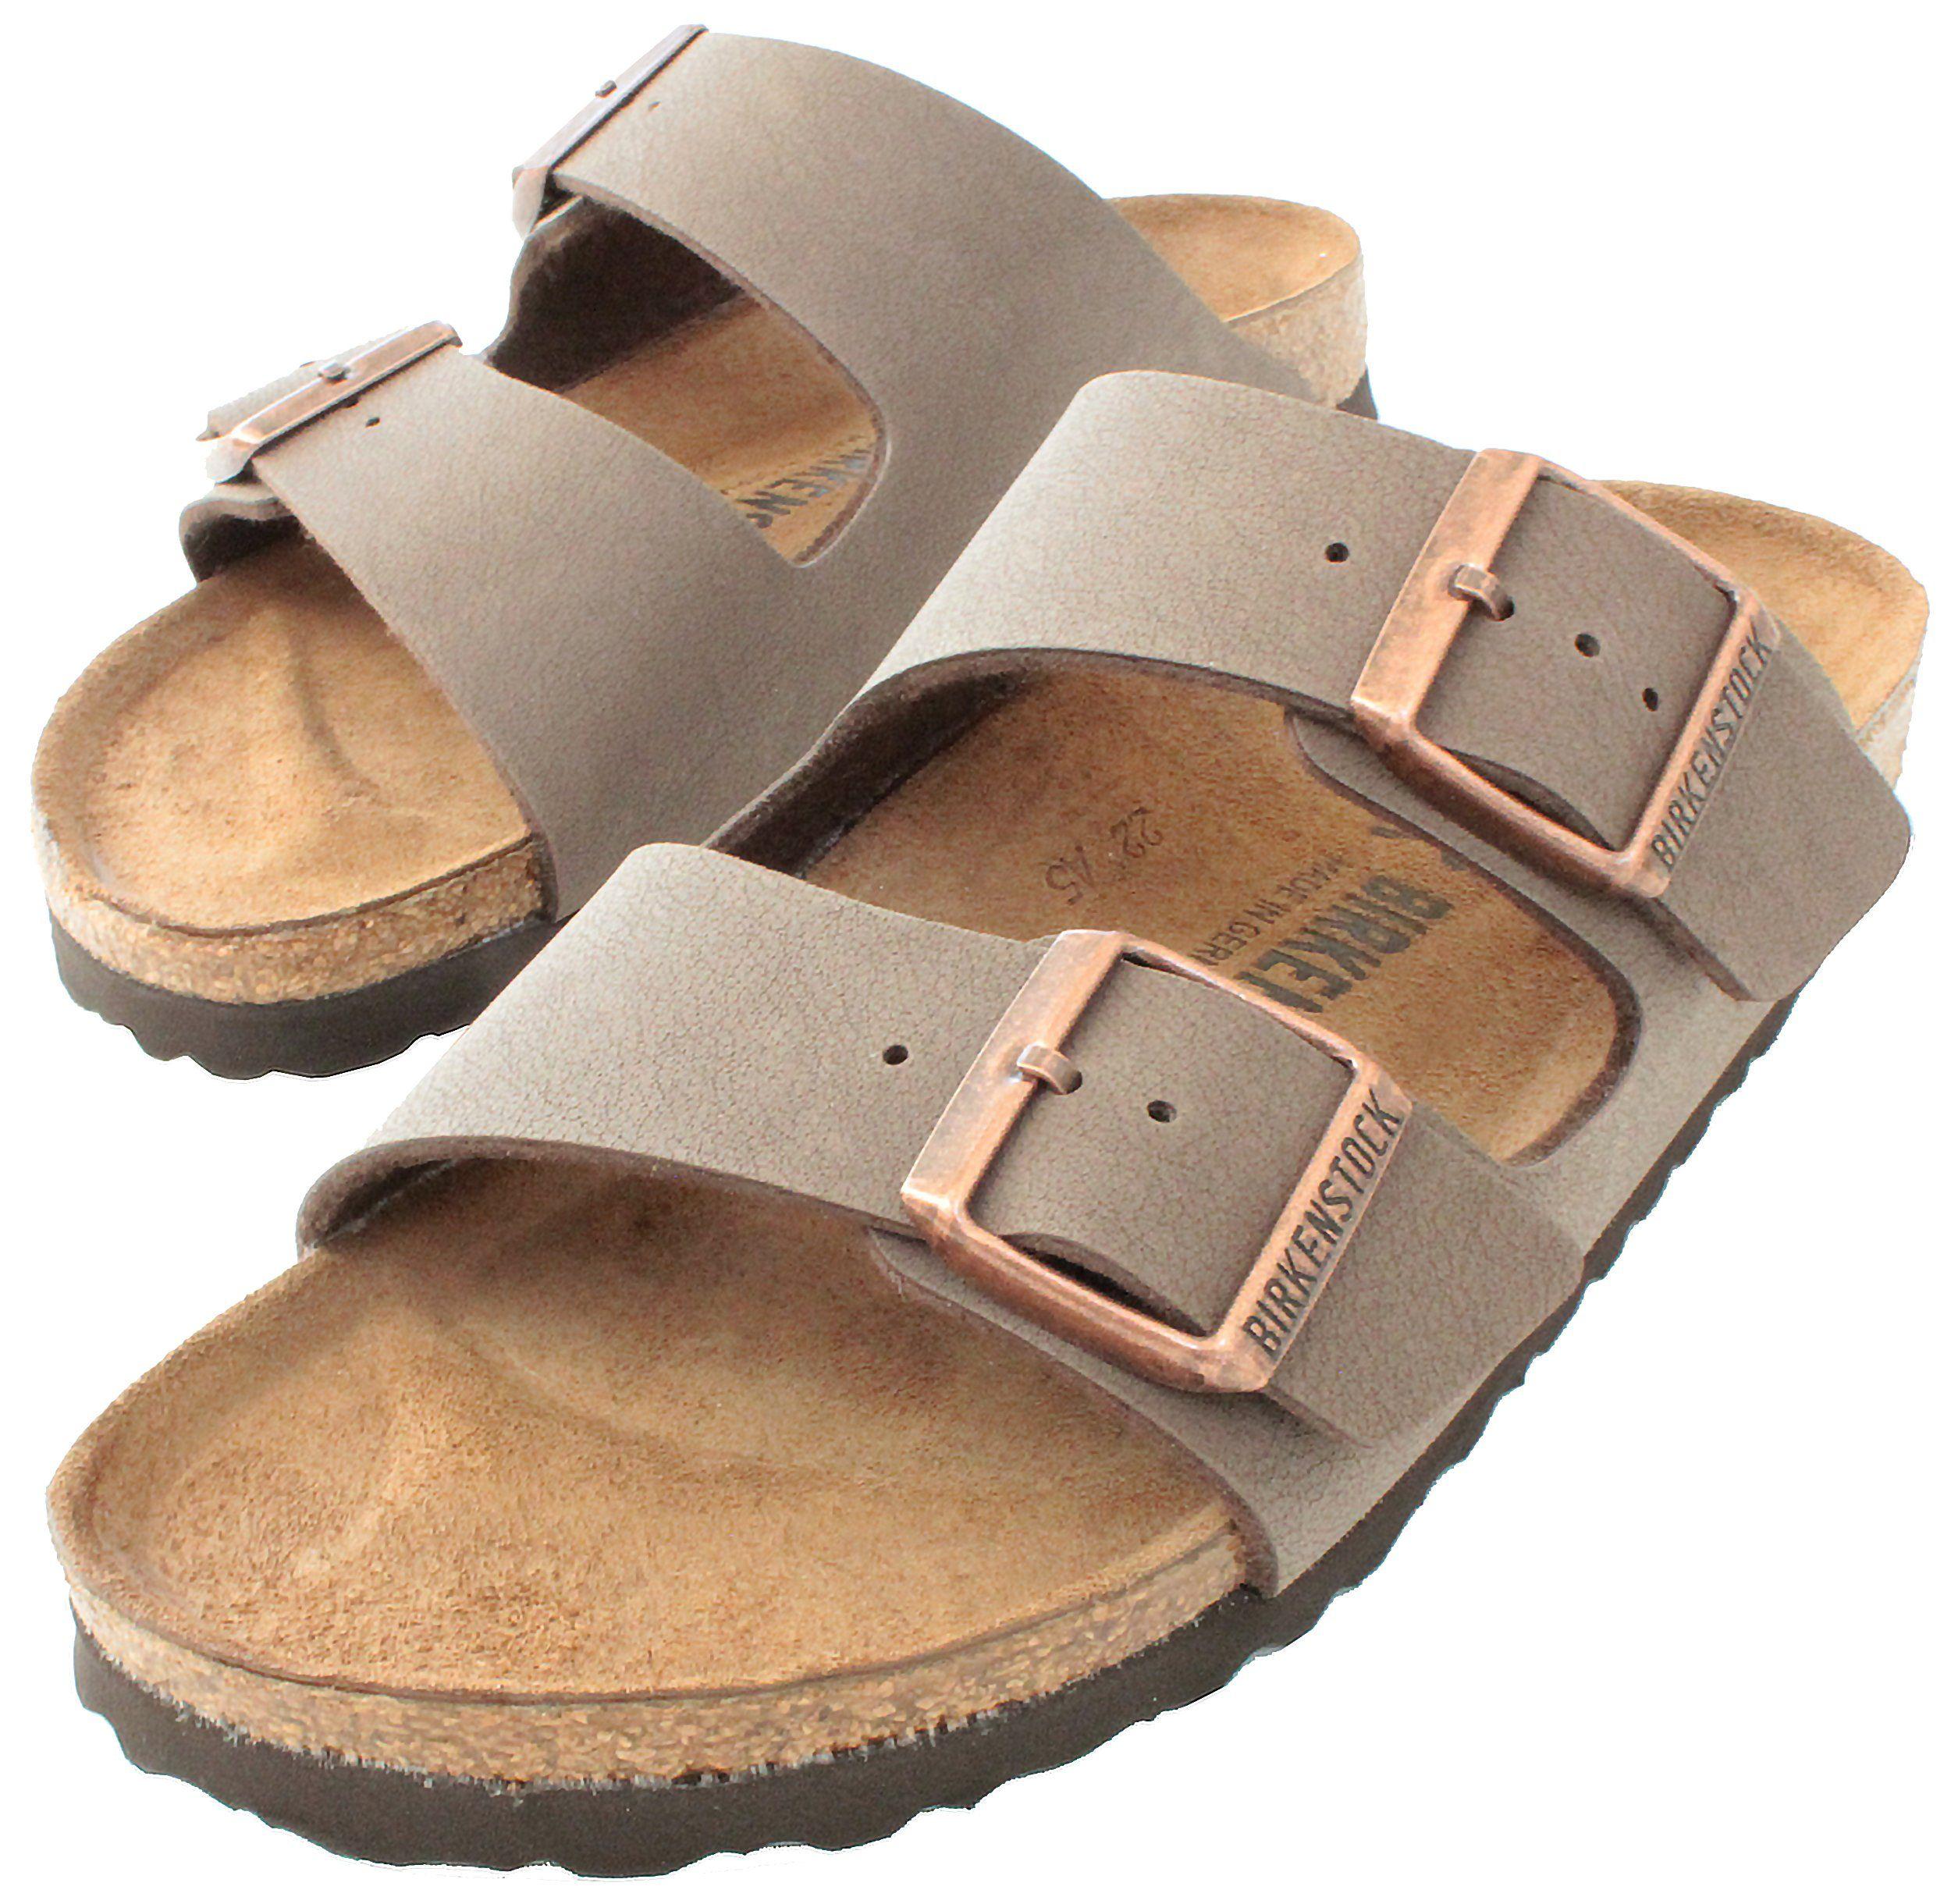 Birkenstock arizona mocha birko flor narrow fit women s sandals 6 6 5